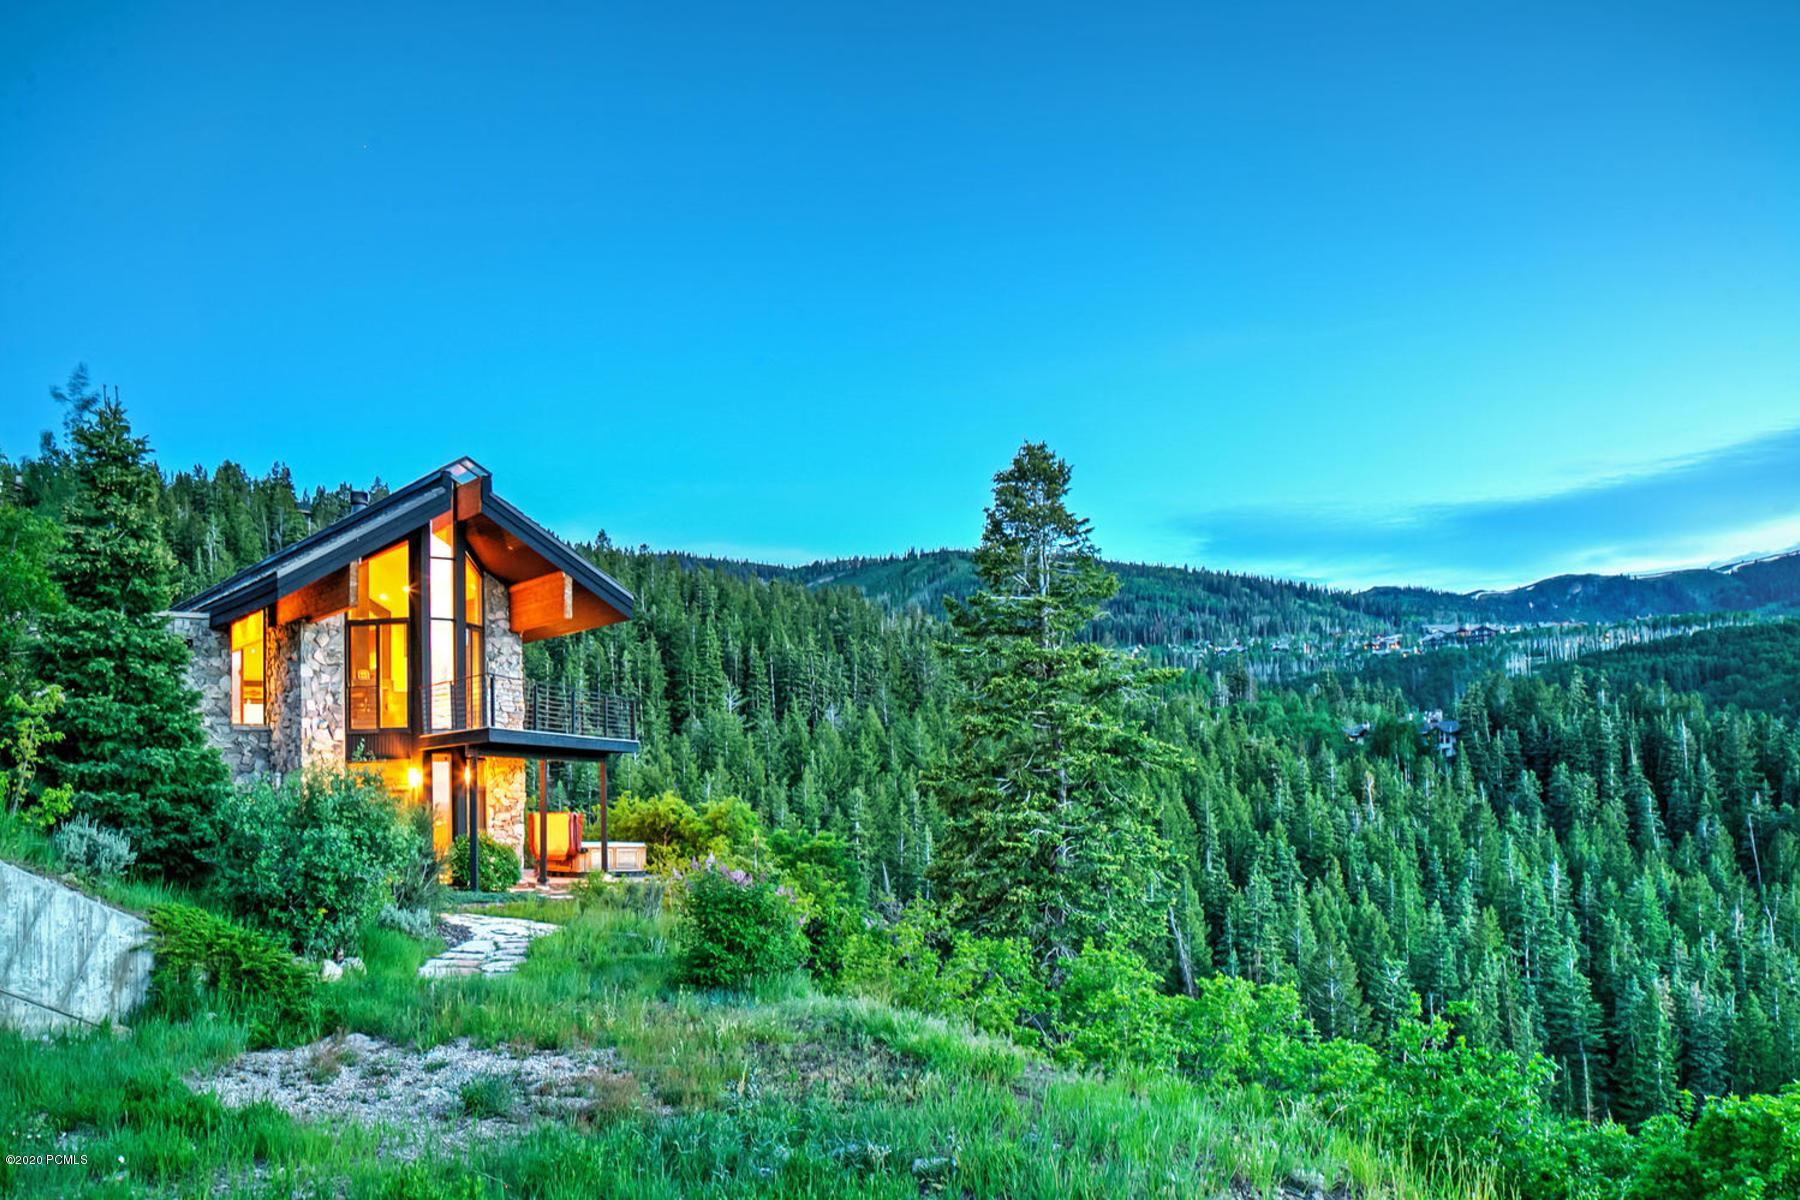 5780 Silver Lake Drive, Park City, Utah 84060, 4 Bedrooms Bedrooms, ,6 BathroomsBathrooms,Single Family,For Sale,Silver Lake,20190109112430415765000000